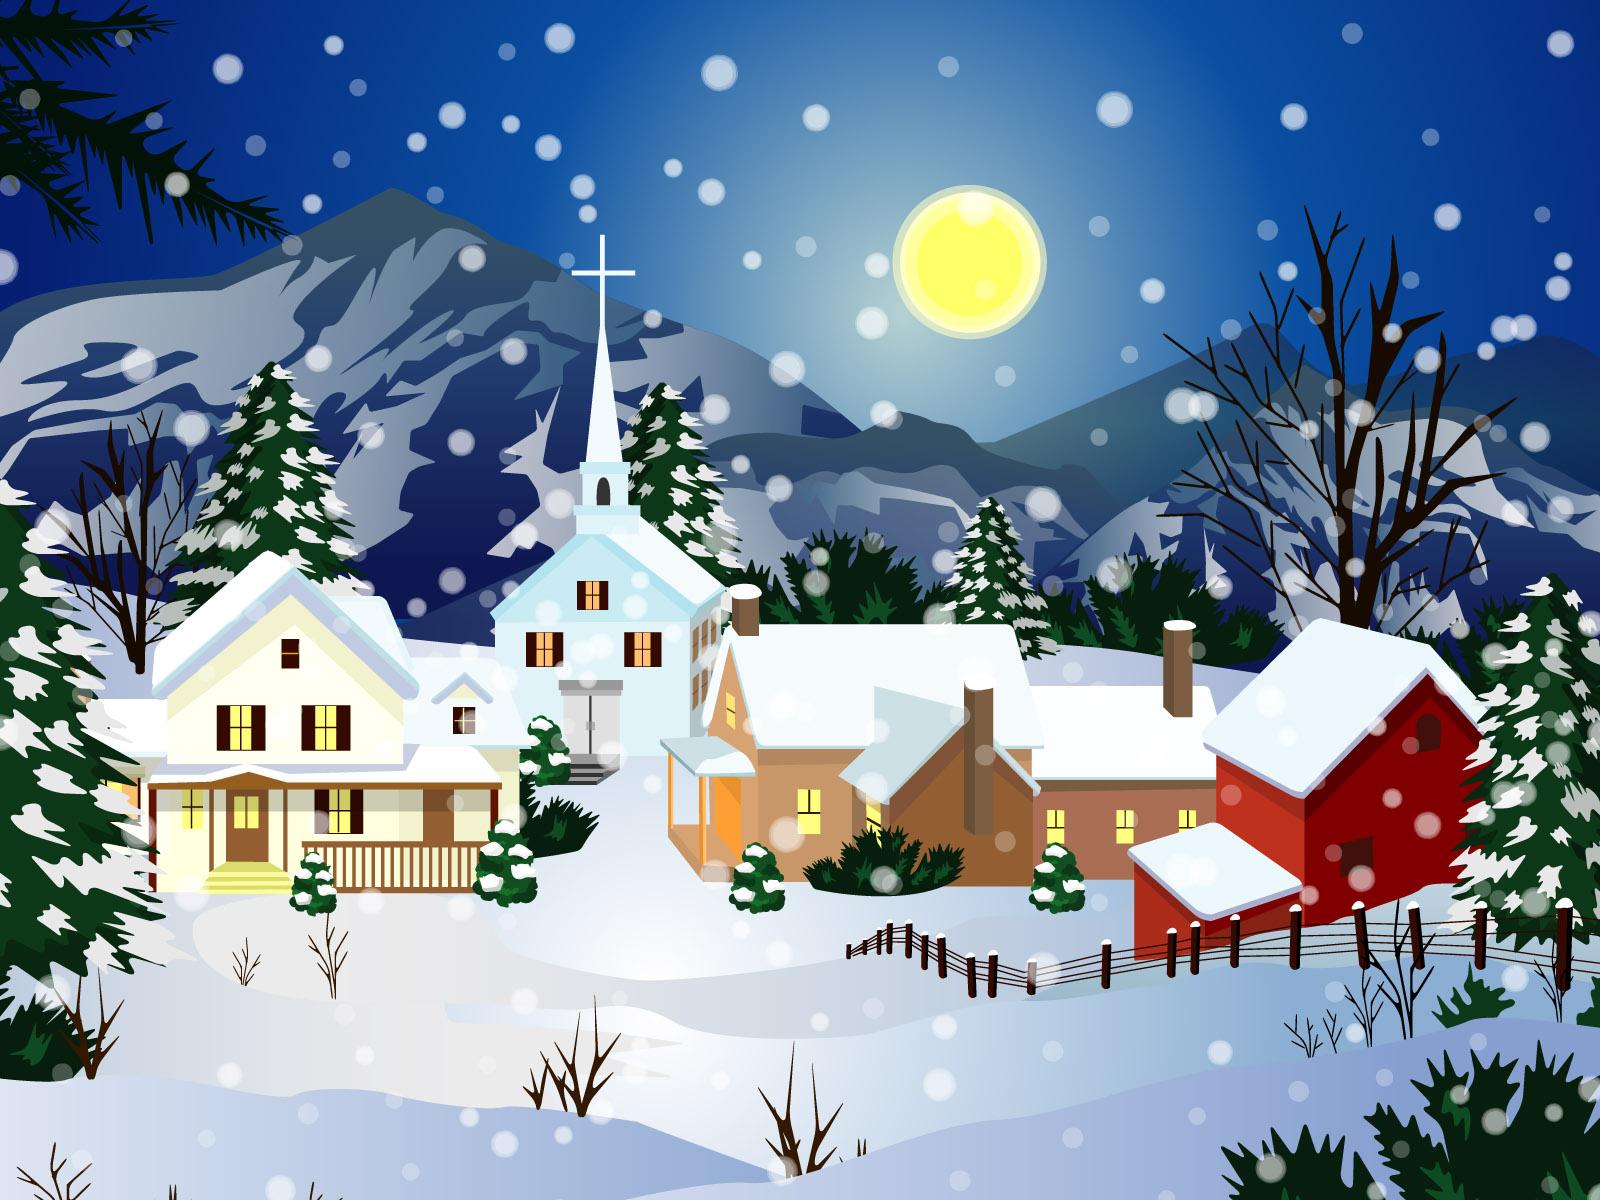 Cool Christmas Snow Effect For Blogs   Royal Shekinah Suite News 1600x1200